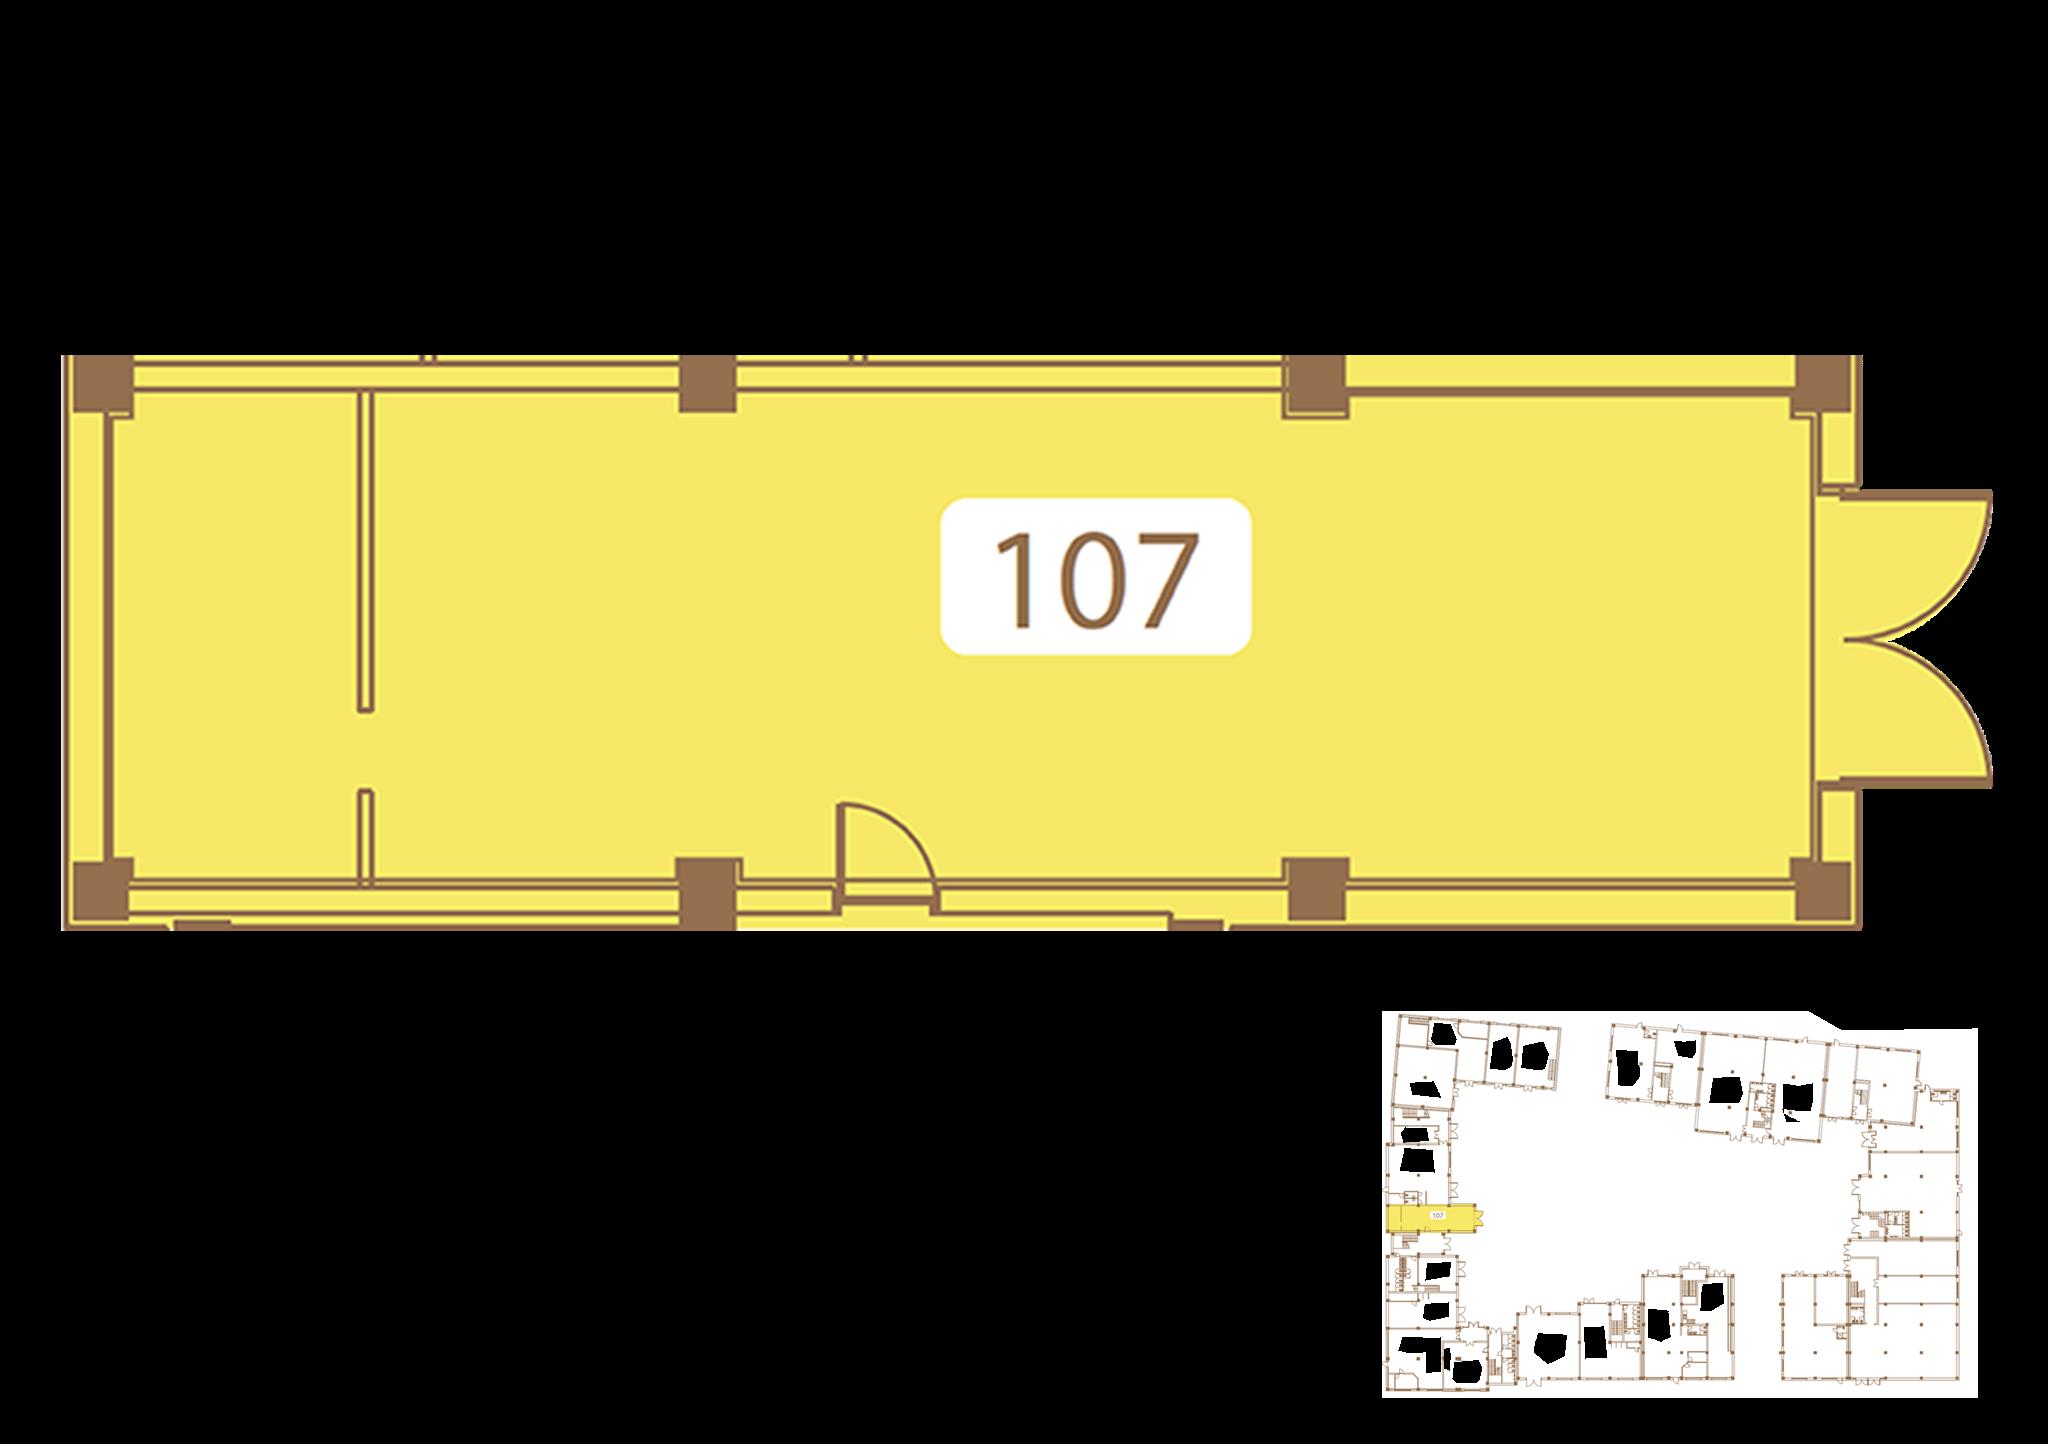 107x1